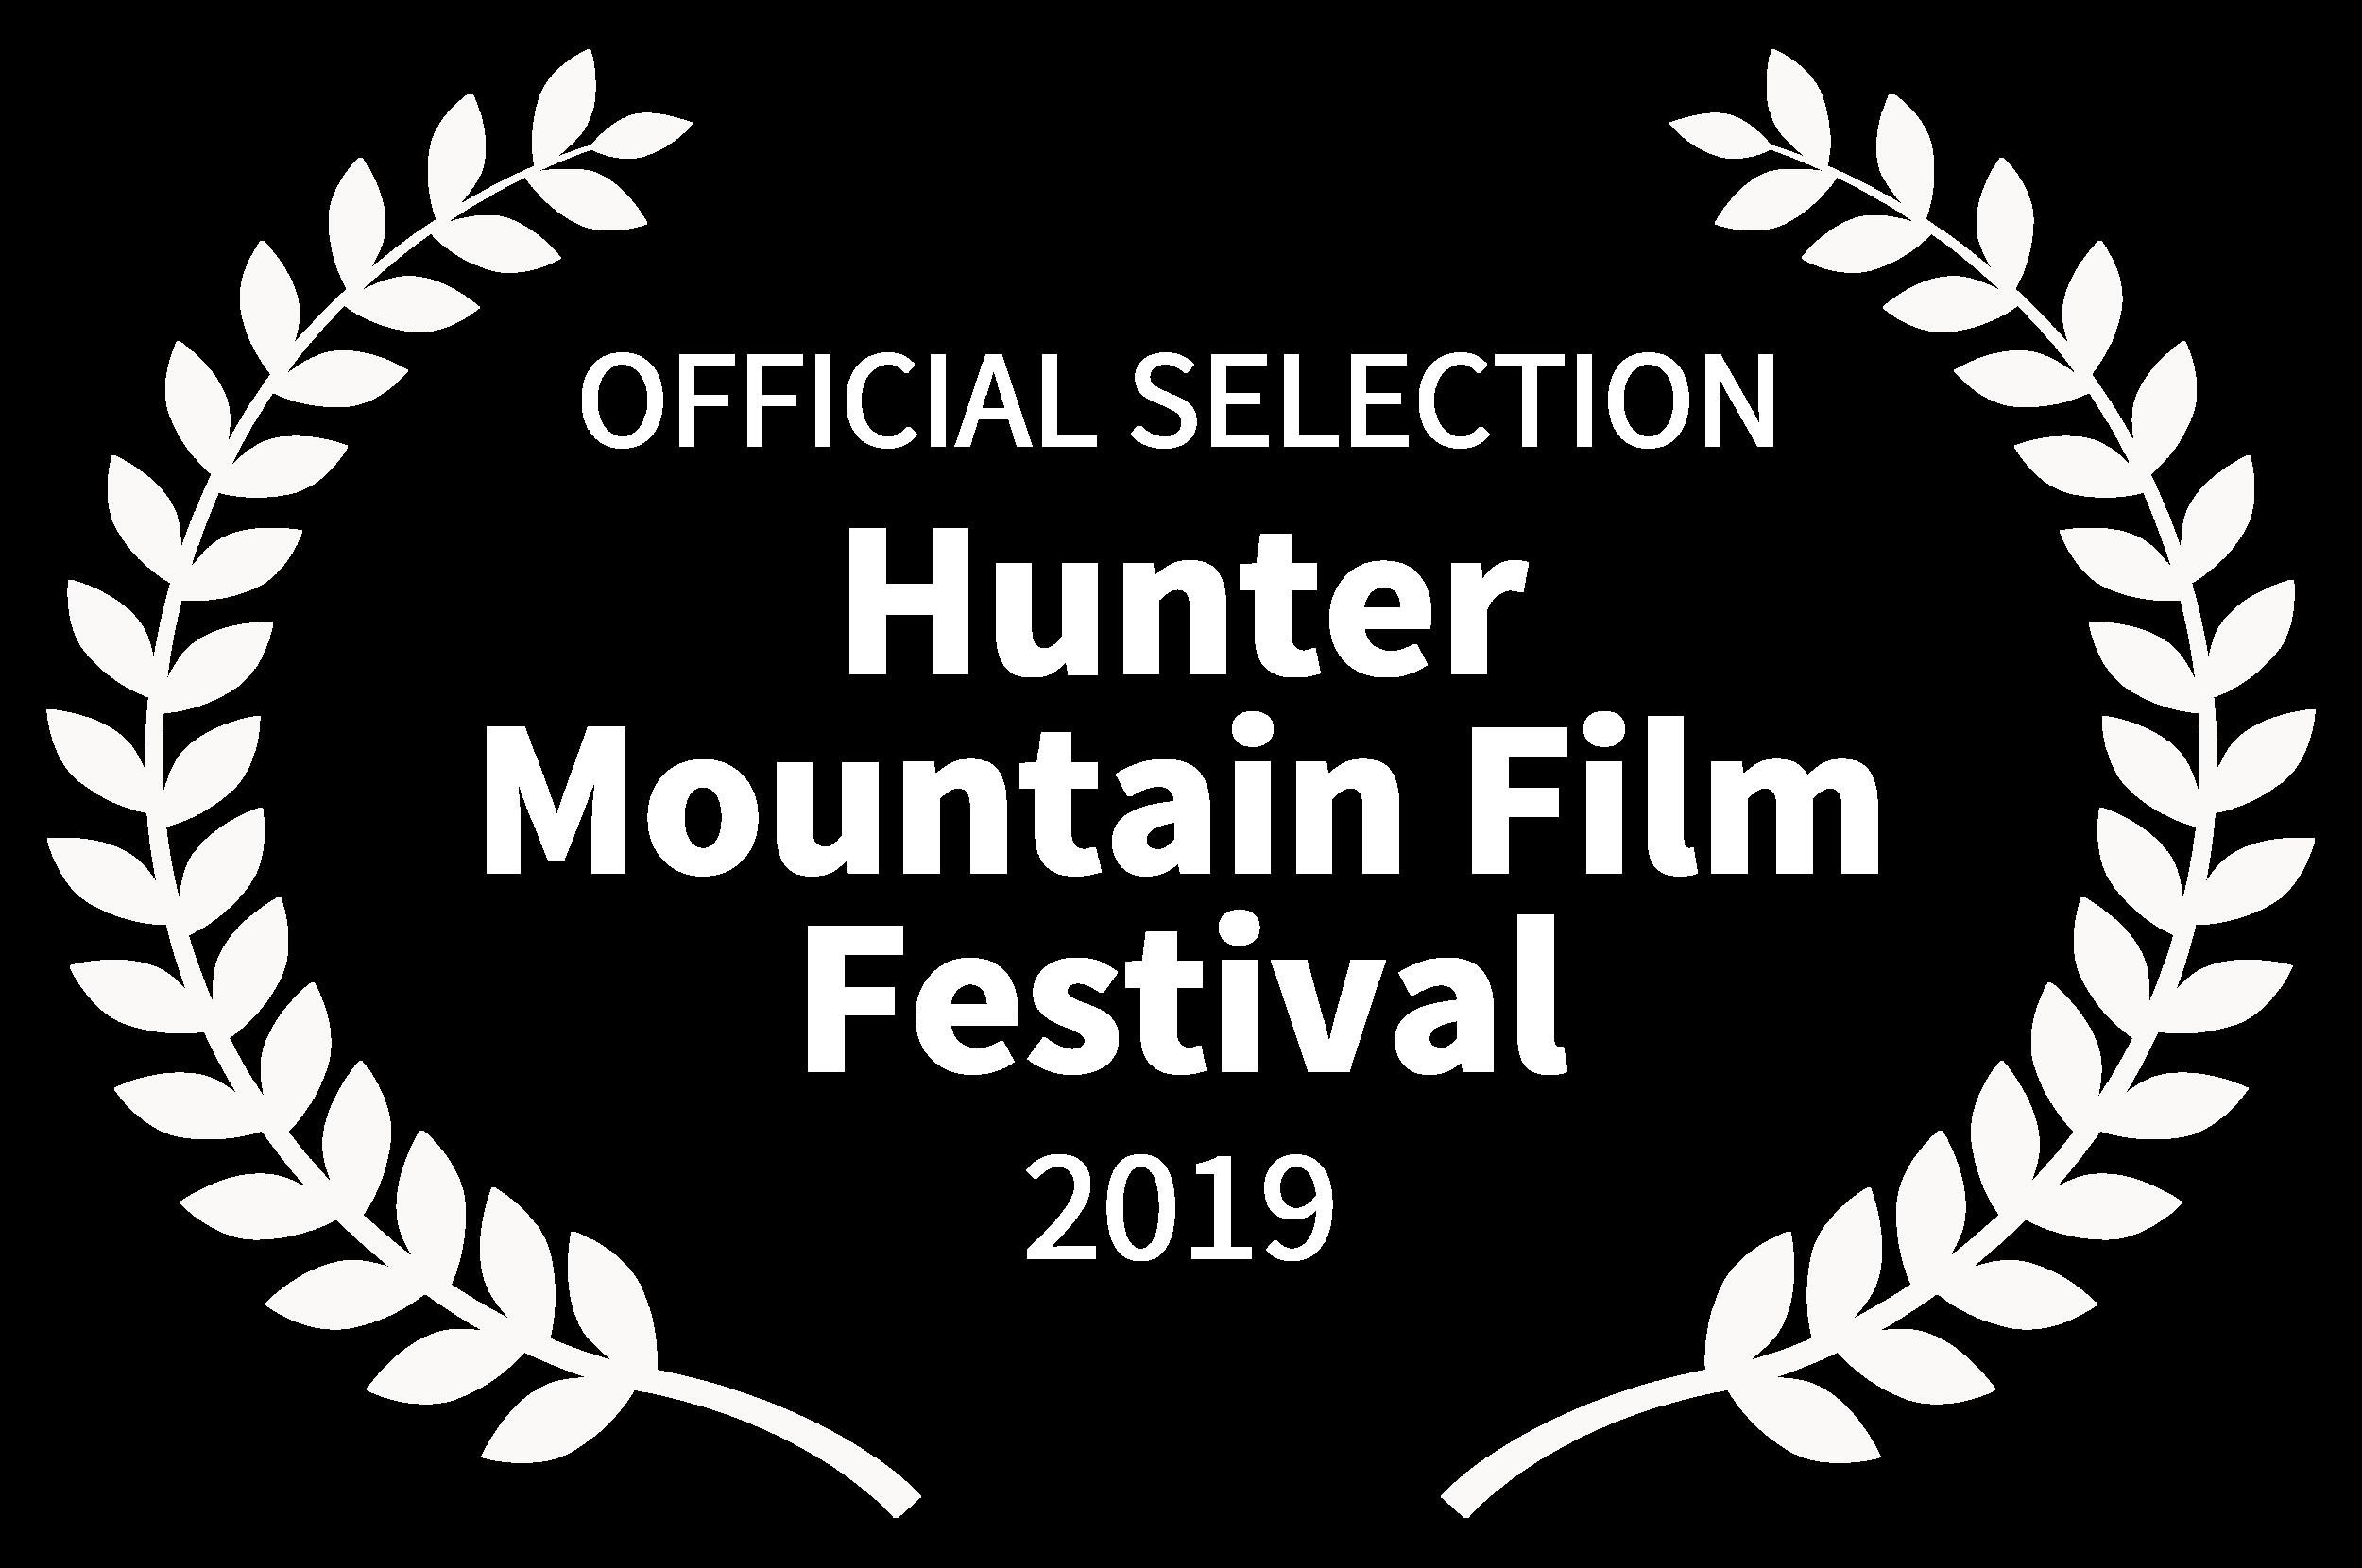 OFFICIALSELECTION-HunterMountainFilmFestival-2019.png